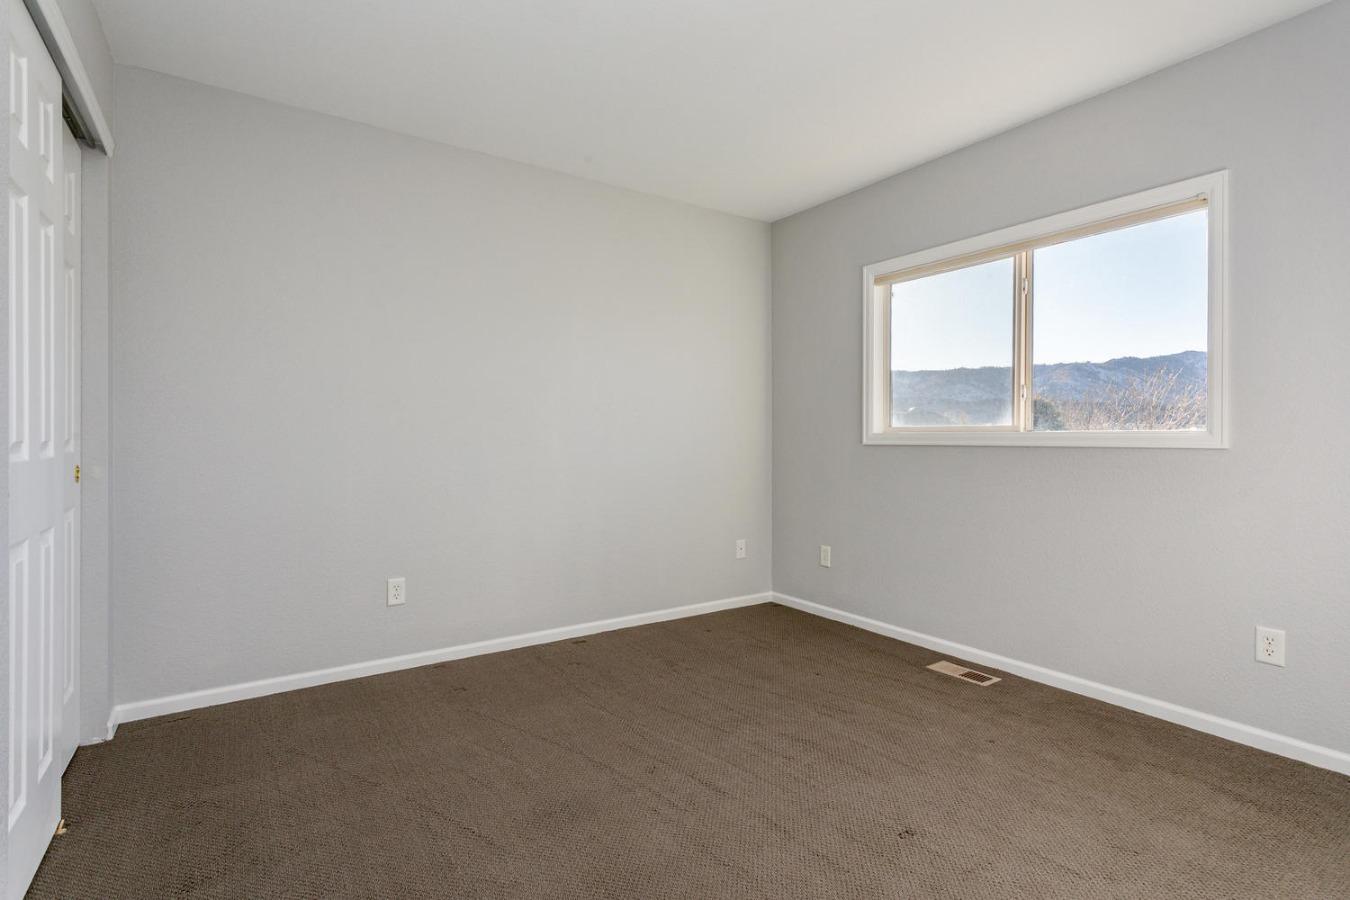 Bedroom #2  New Carpet Throughout Upper Floors